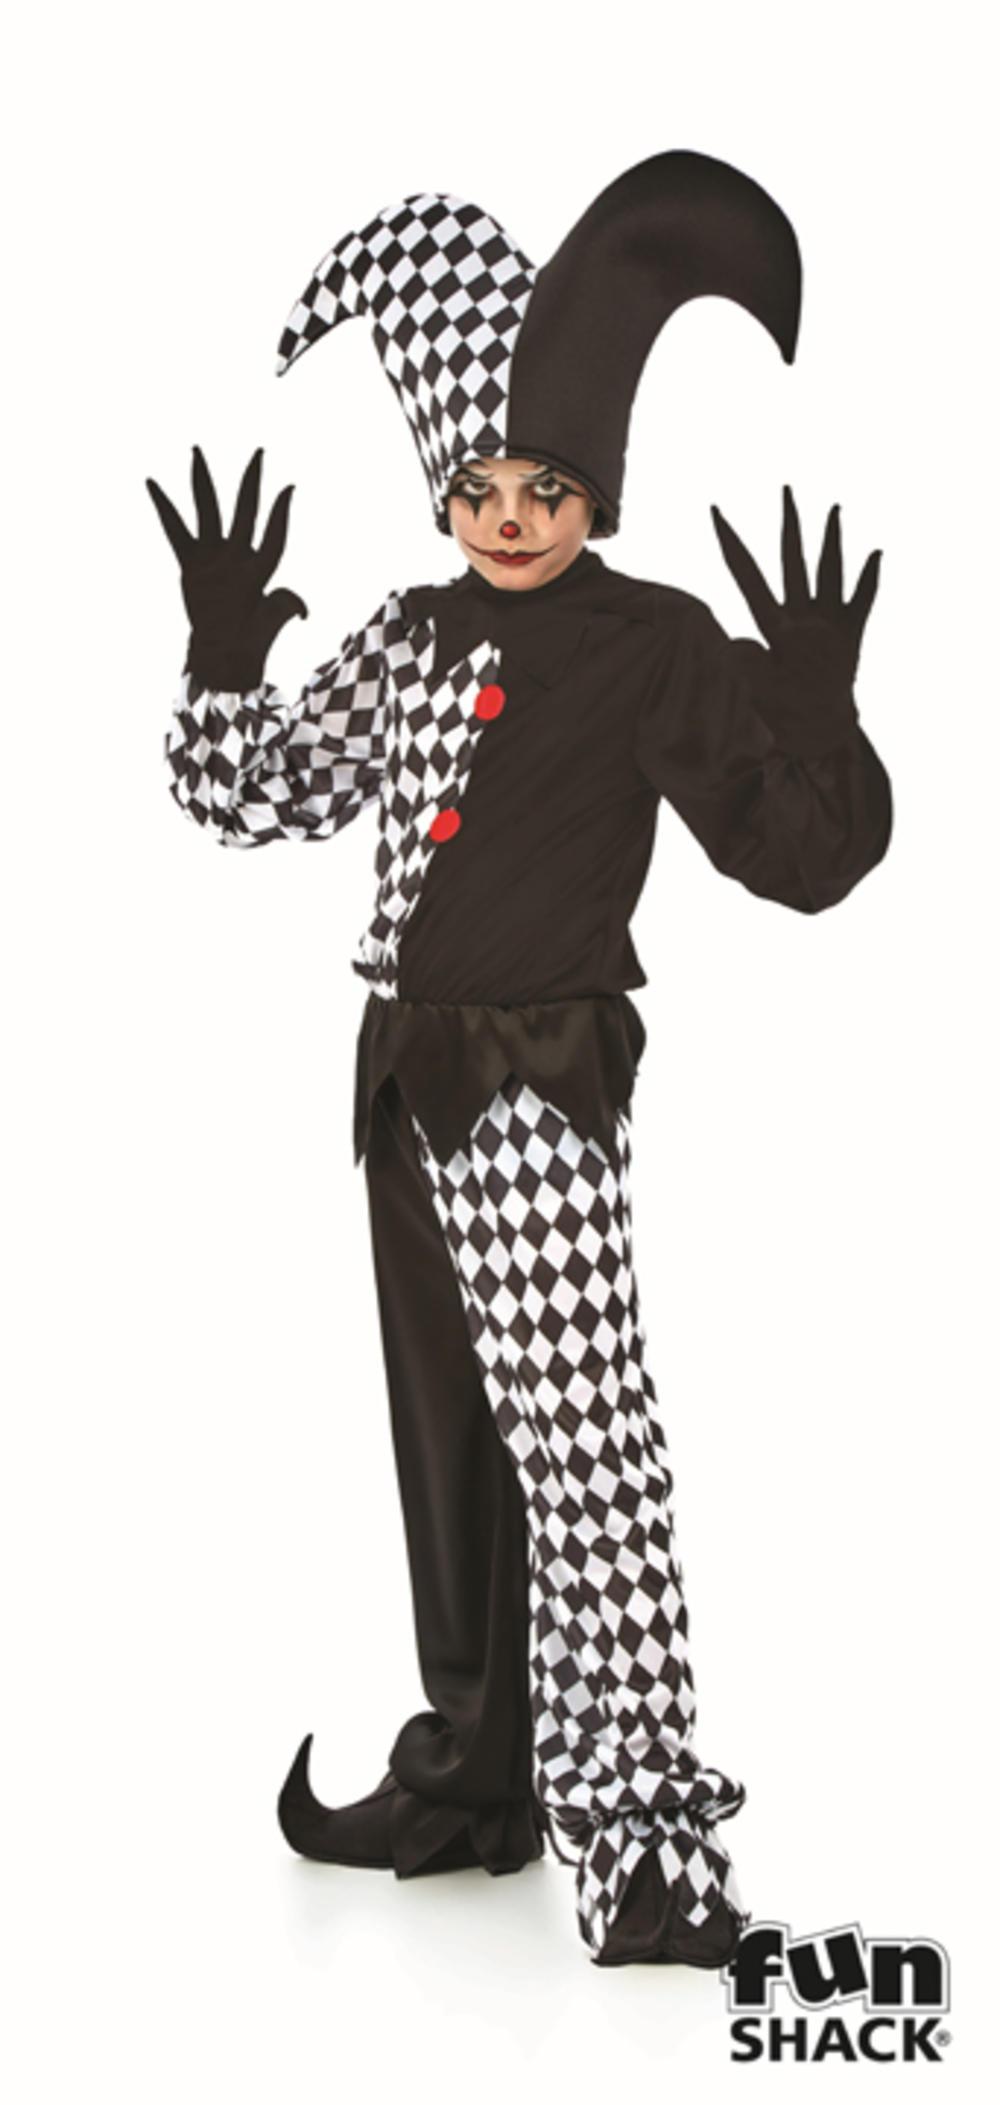 Jester Boys Fancy Dress Gothic Circus Clown Joker Kids Scary Halloween Costume